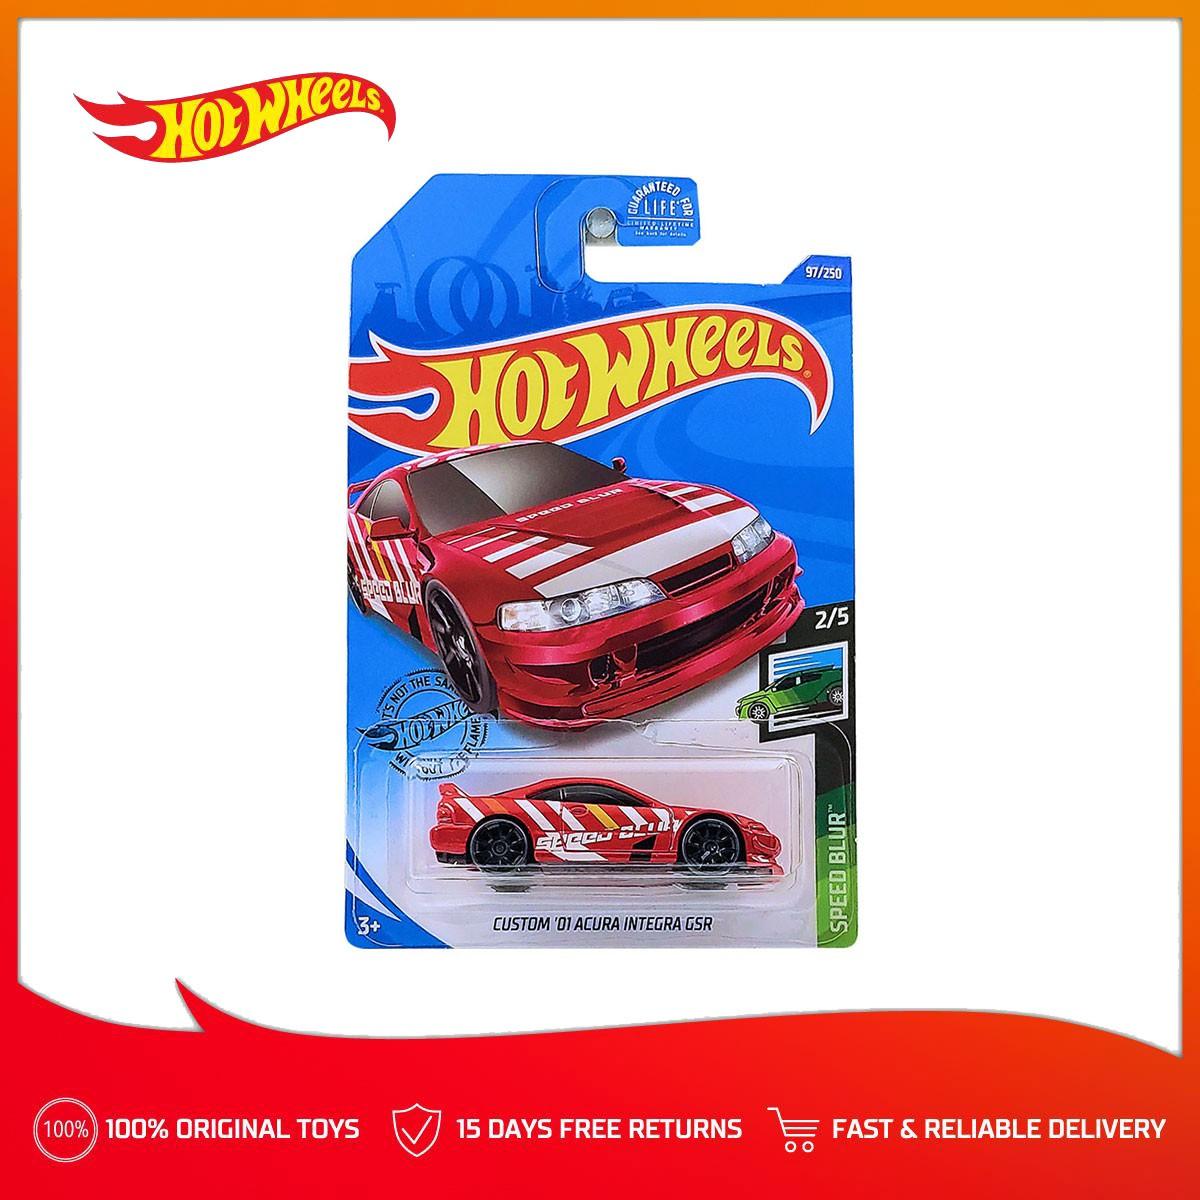 Hot Wheels Basic Car Custom 01 Acura Integra Gsr Red Case J Shopee Philippines